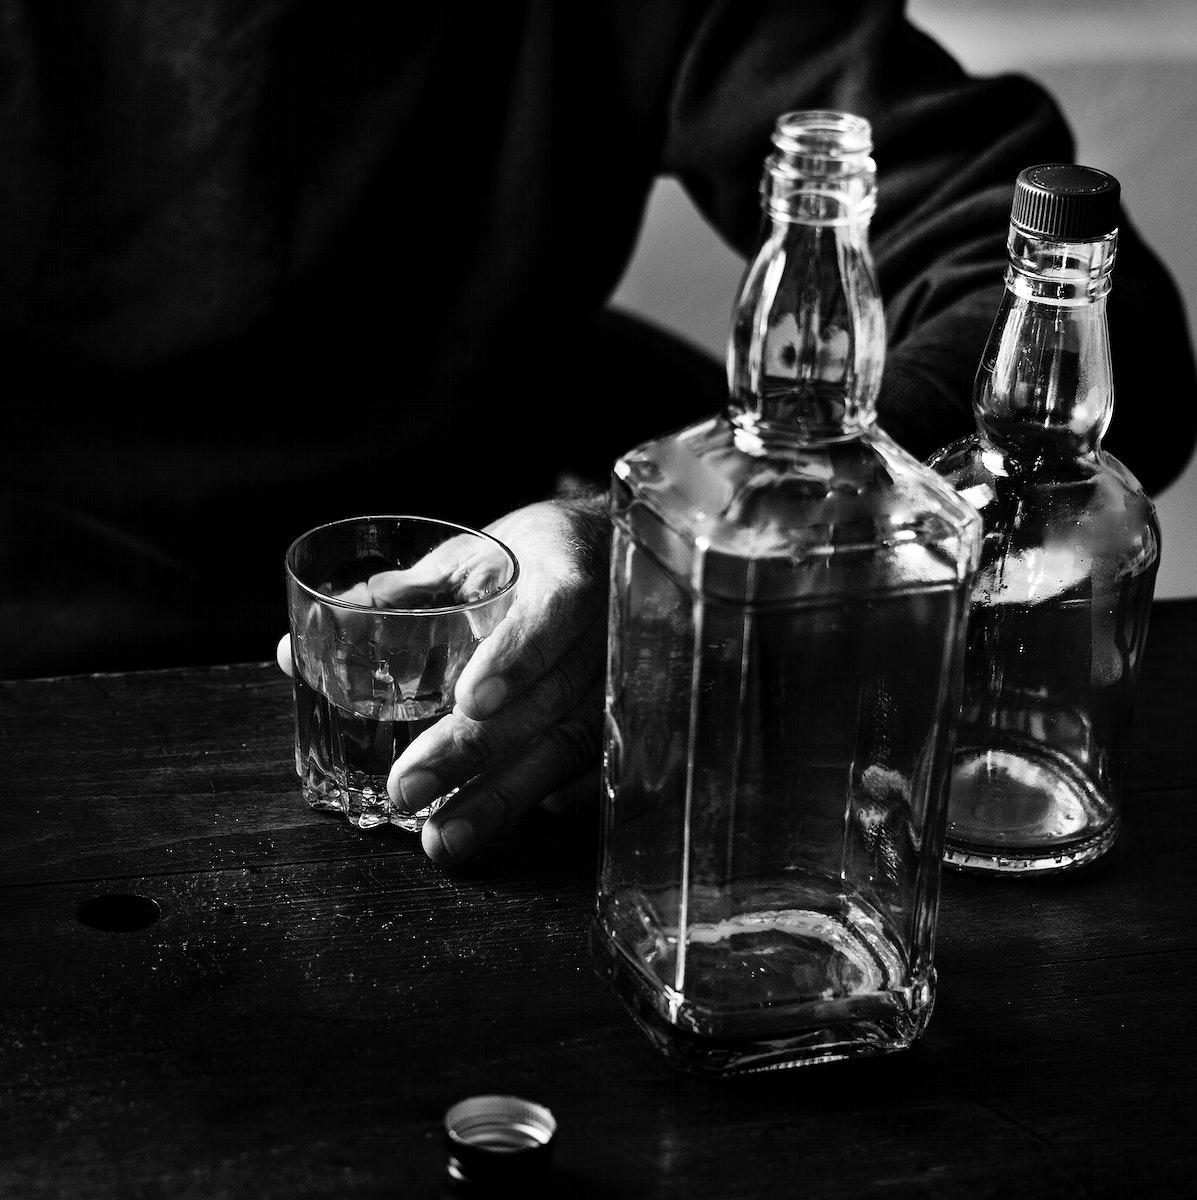 Adults consuming alcohol shoot